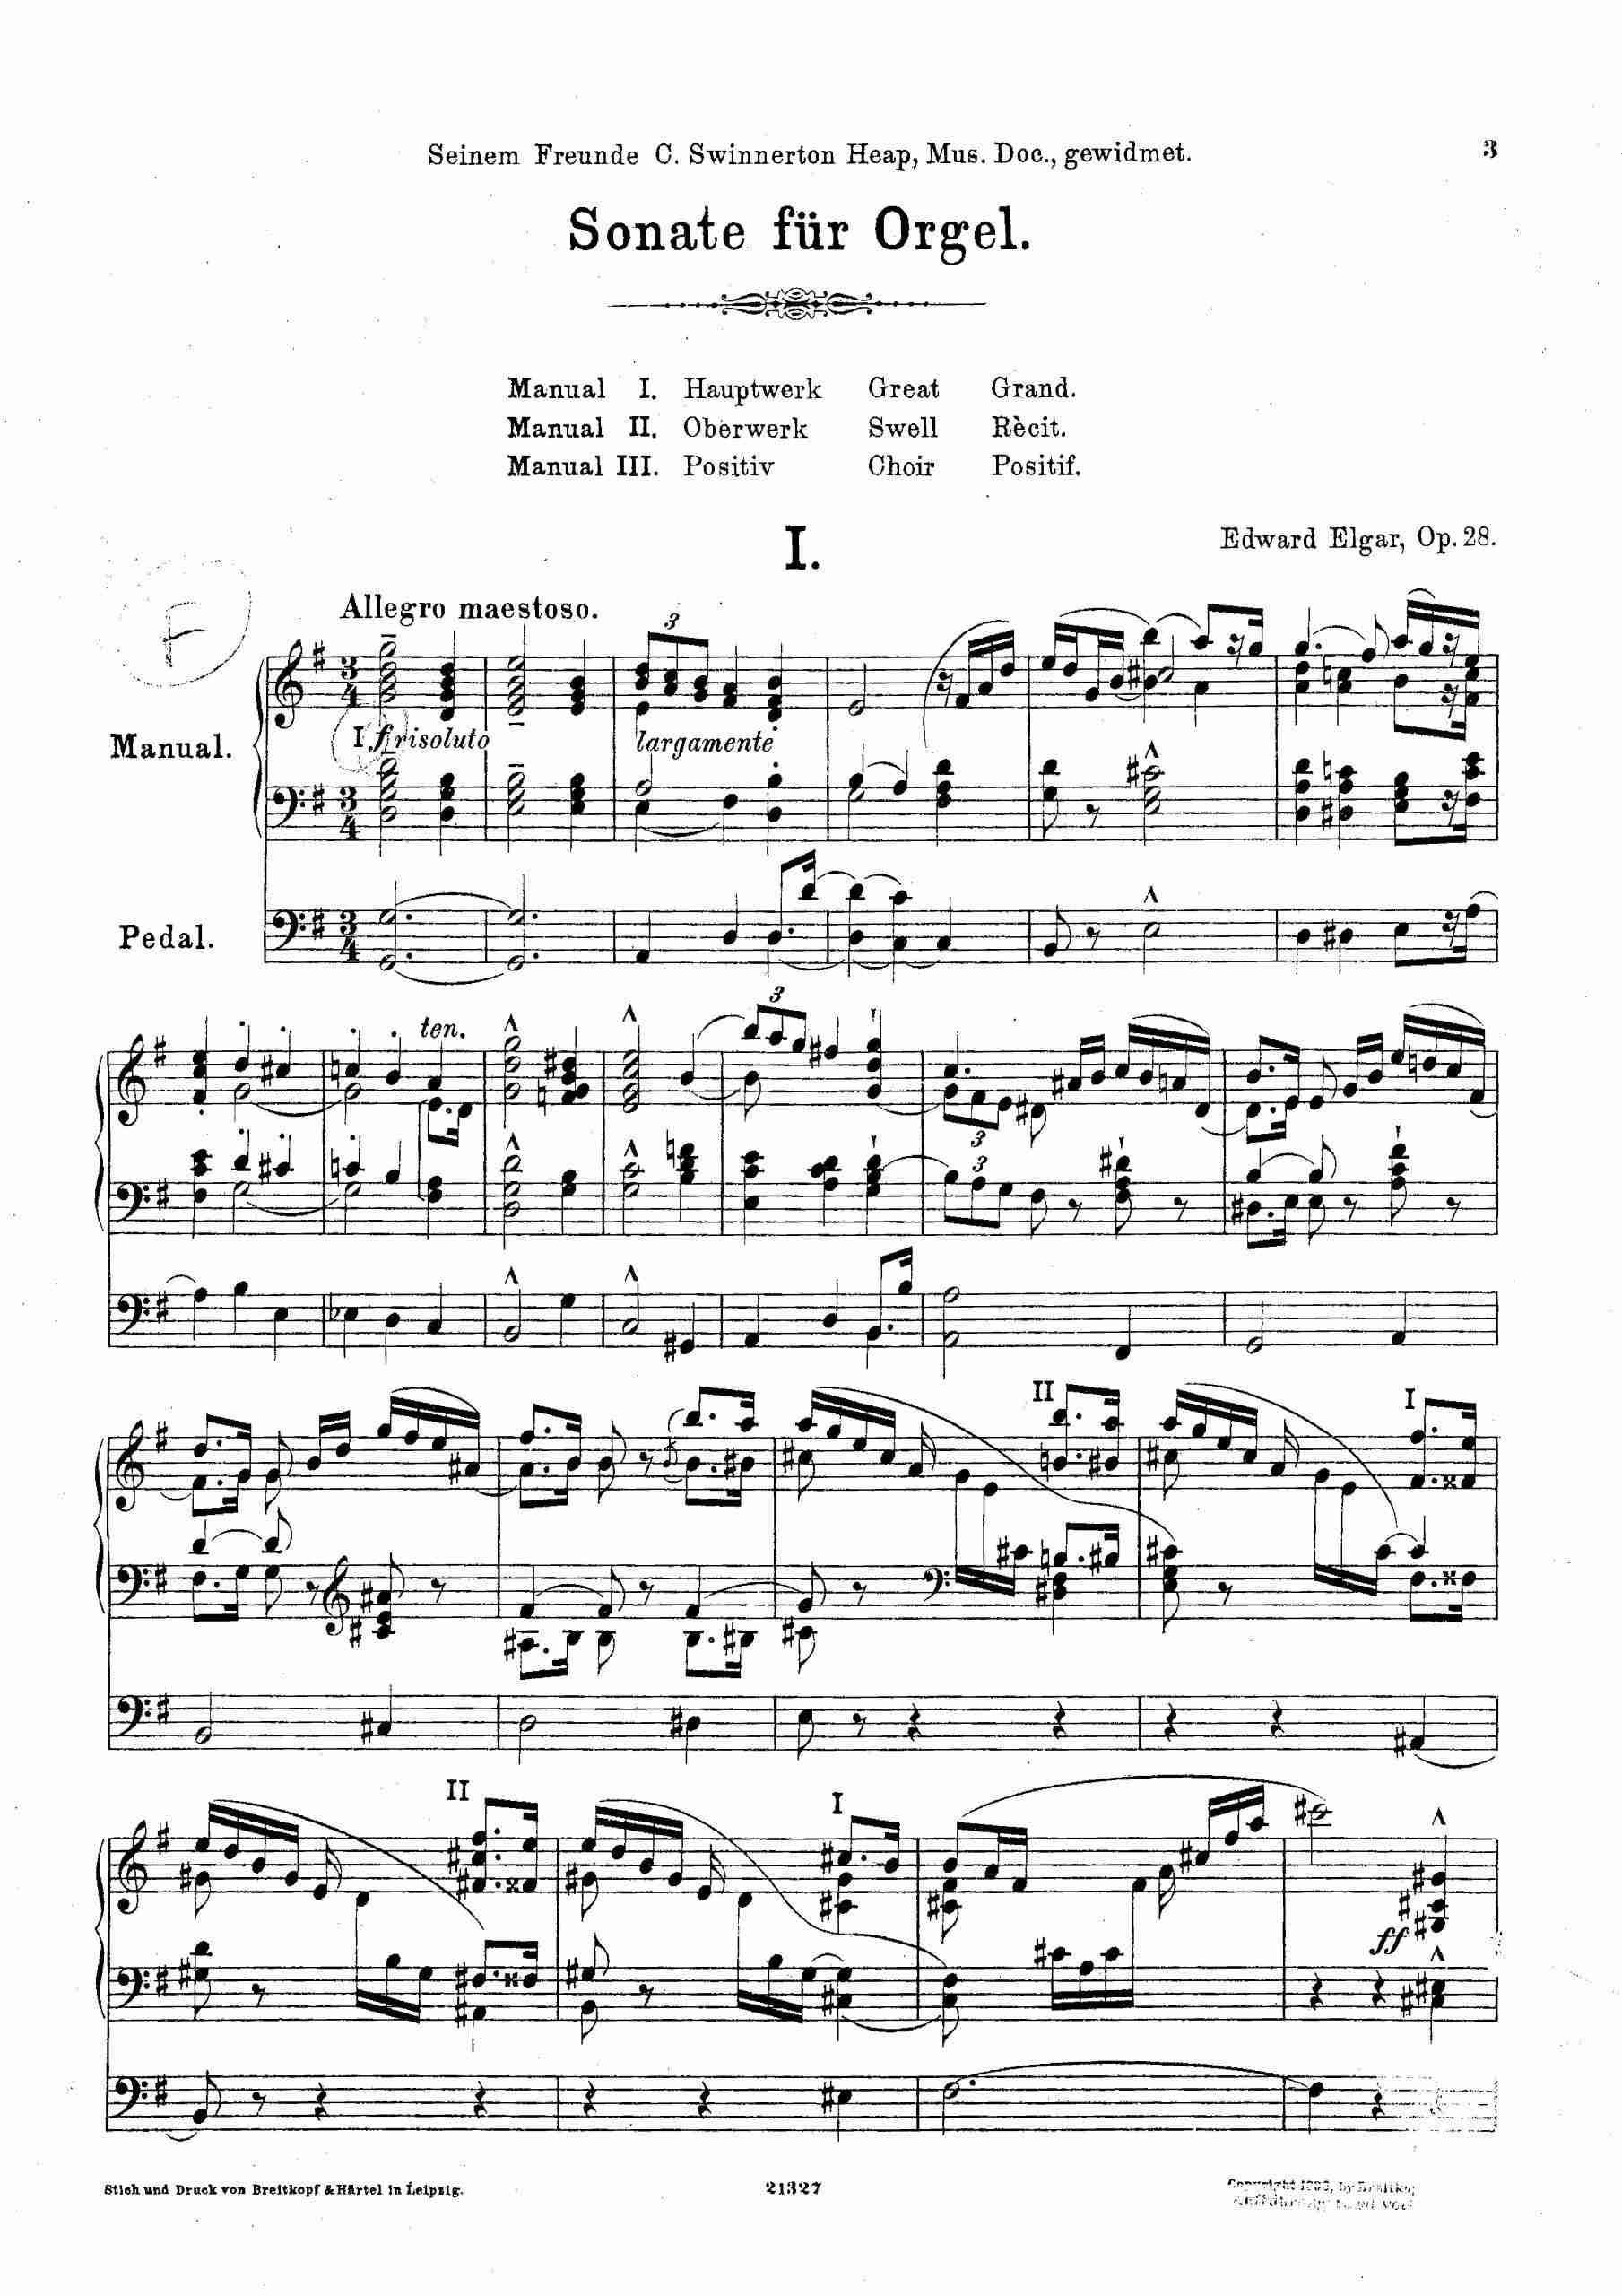 Elgar, Edward - Organ Sonata, Op.28